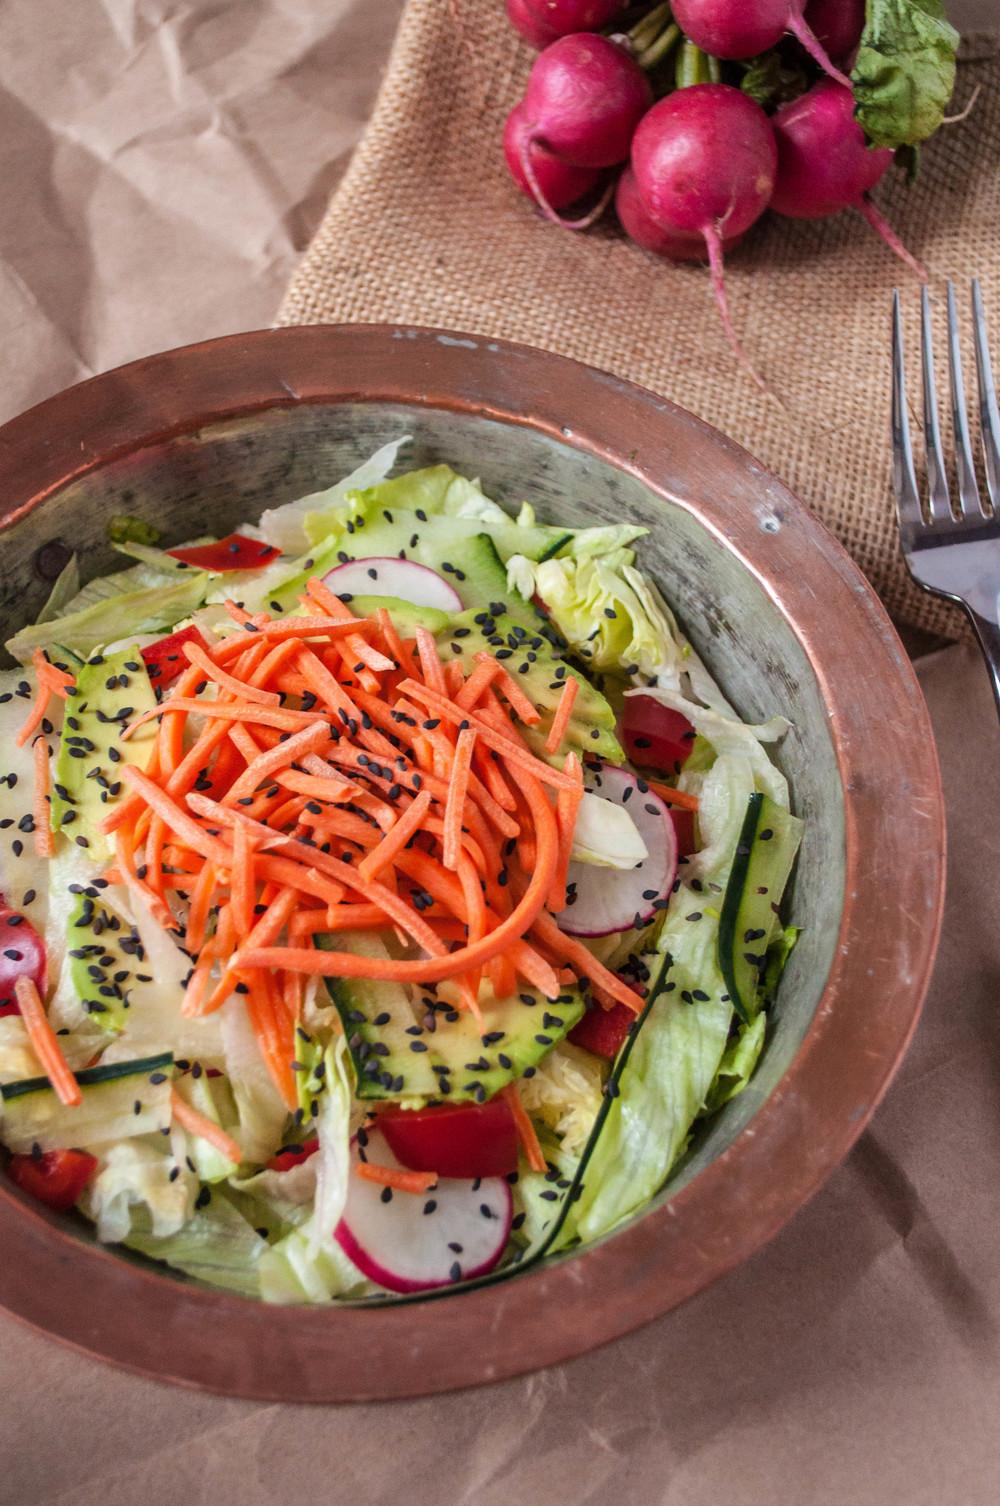 Vegan Thai Salad with Spicy Cashew Dressing